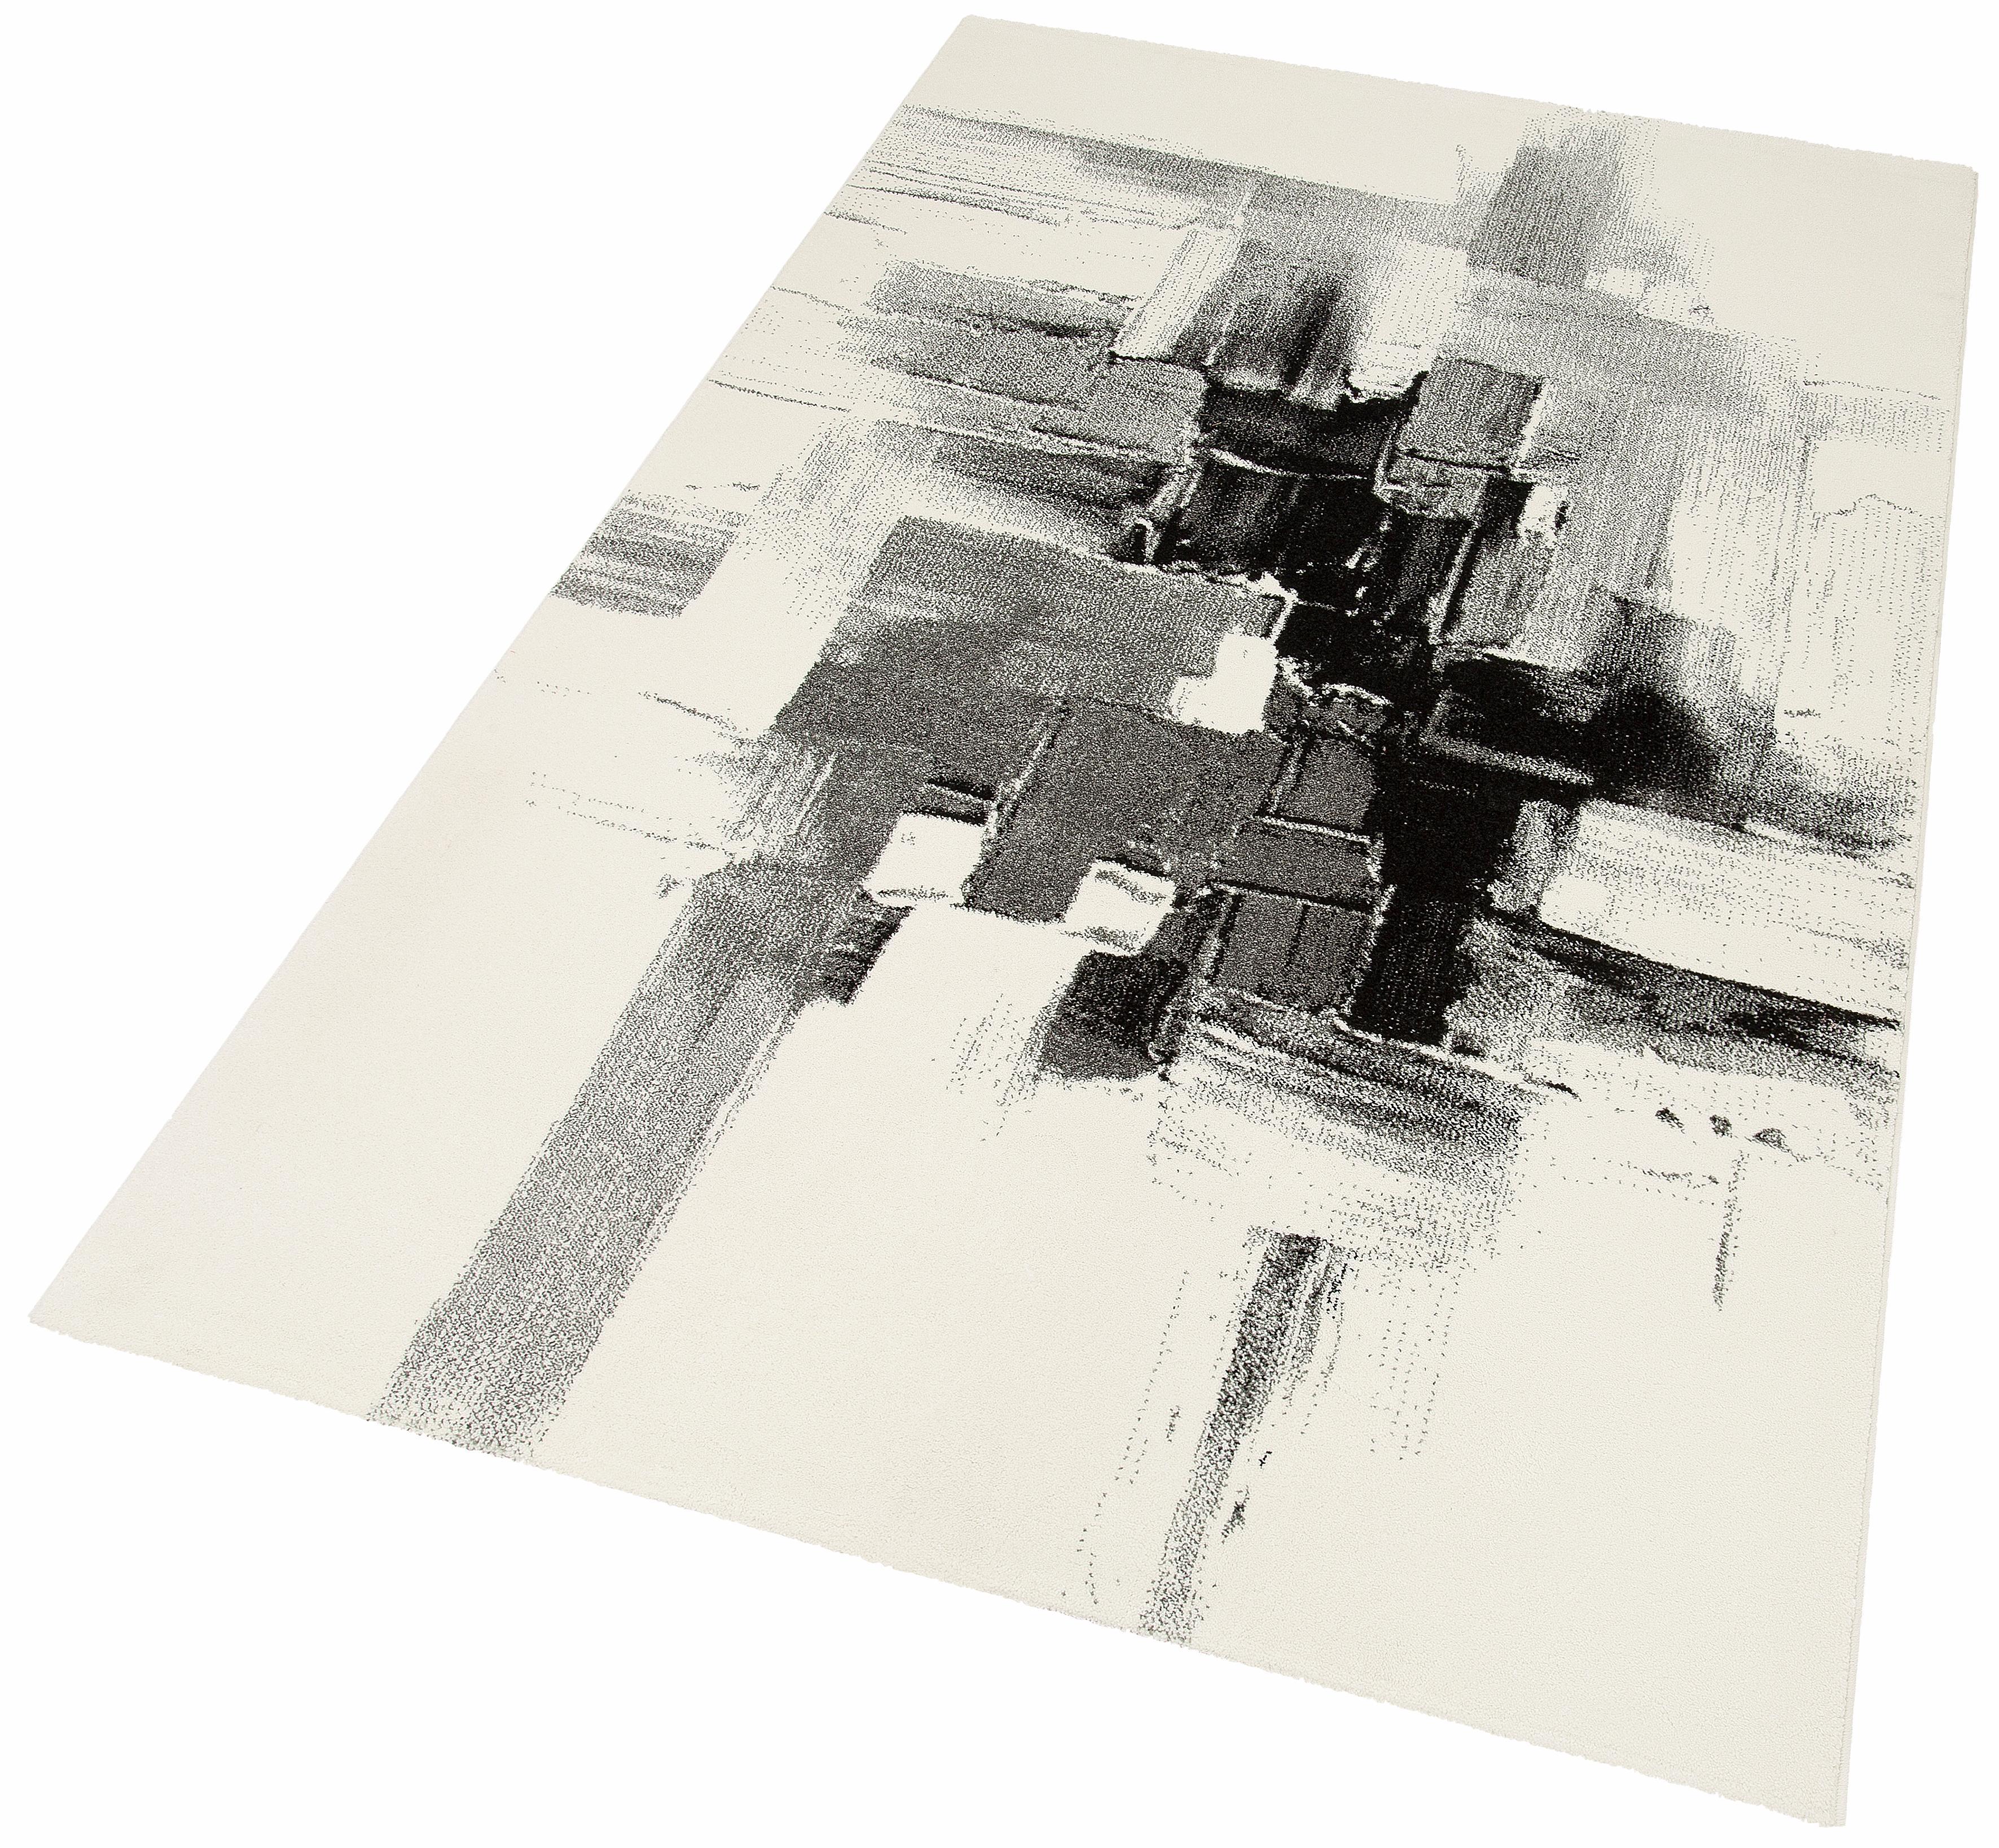 Teppich BELIS MULTI merinos rechteckig Höhe 13 mm maschinell gewebt